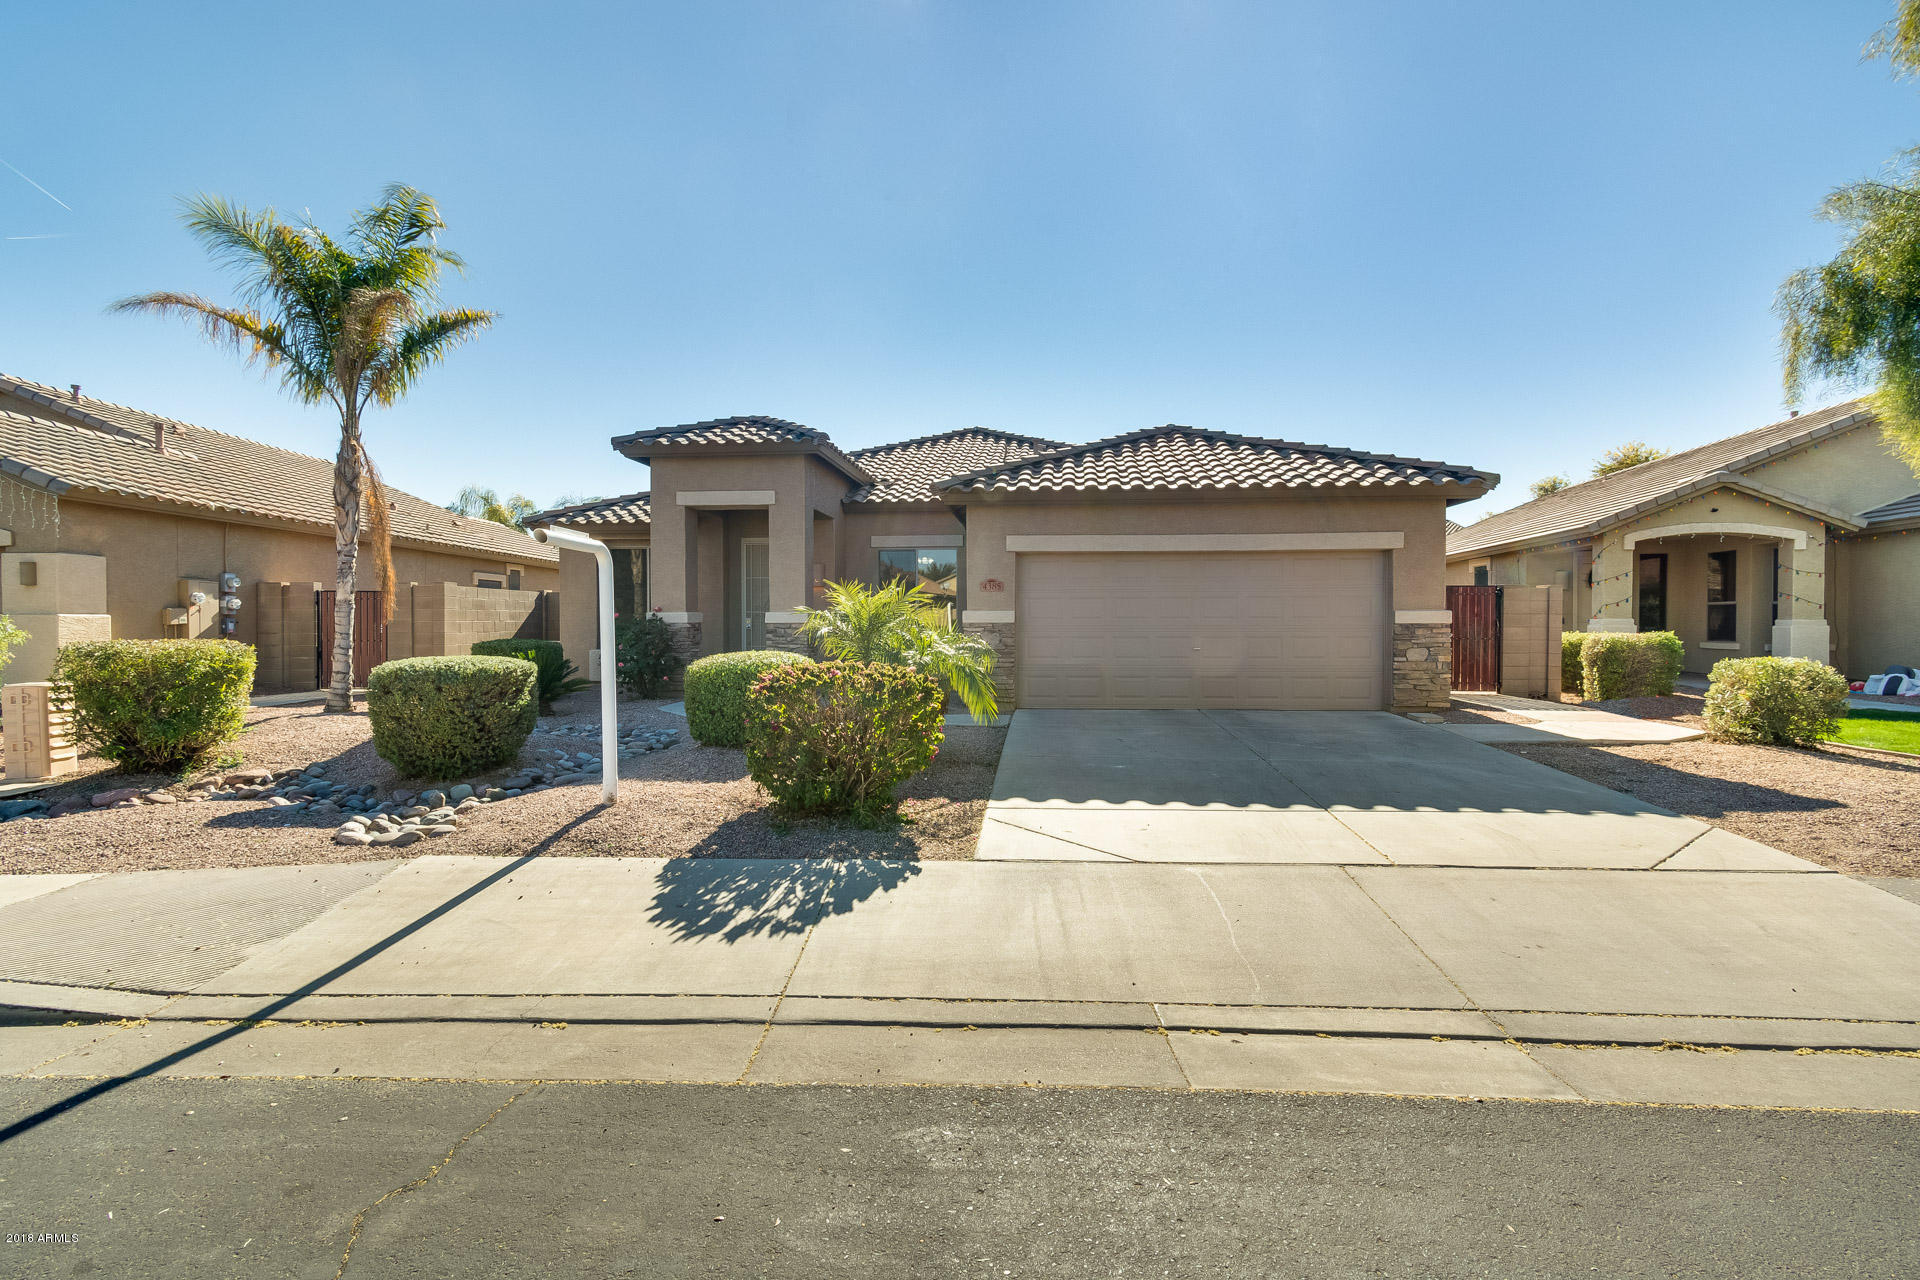 Photo of 4385 E CHERRY HILLS Drive, Chandler, AZ 85249